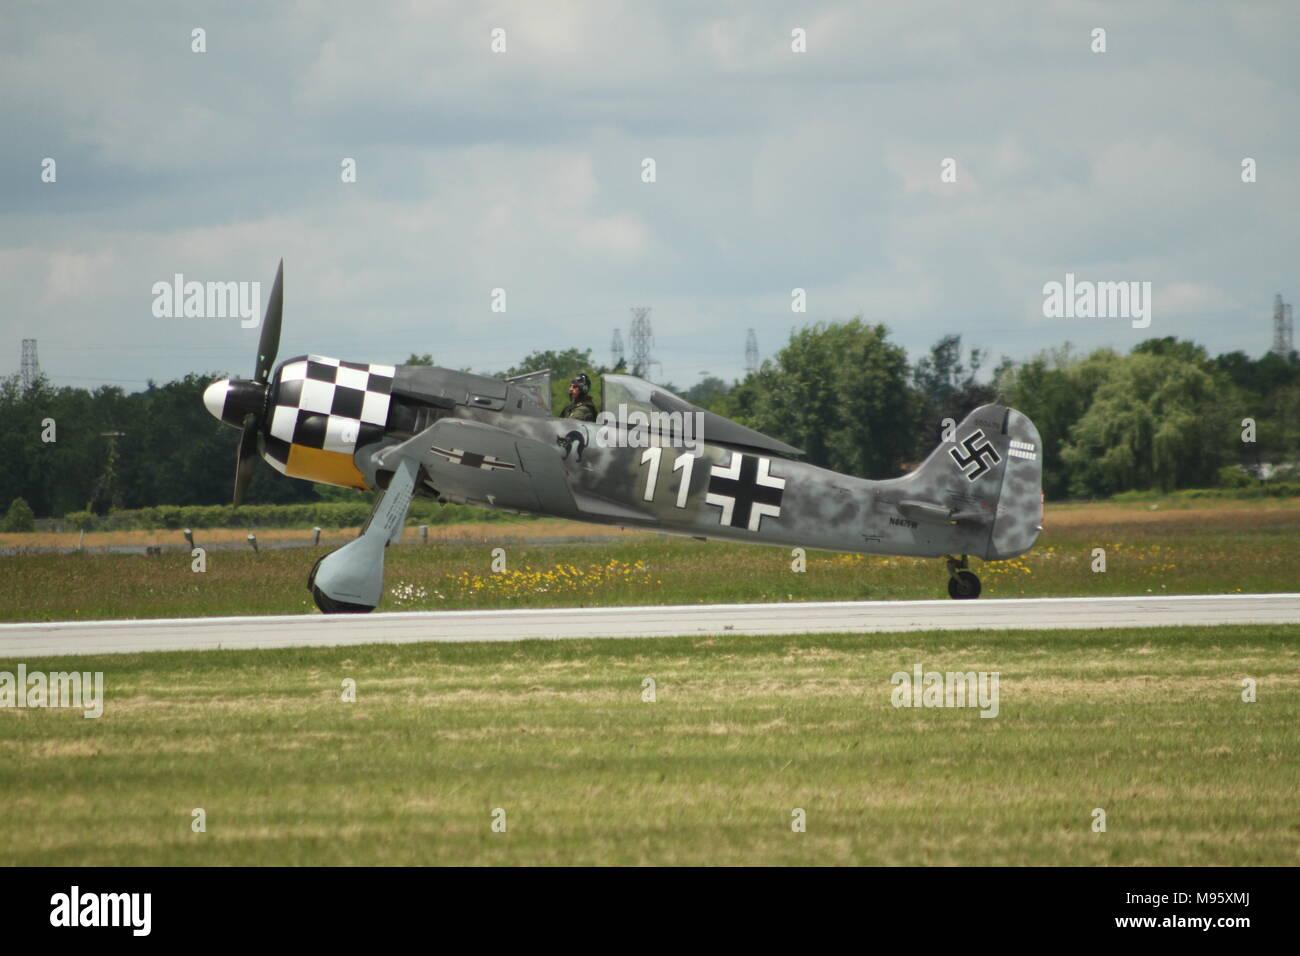 German Focke-Wulf Fw 190 Ready to take flight at the Hamilton Airshow - Stock Image